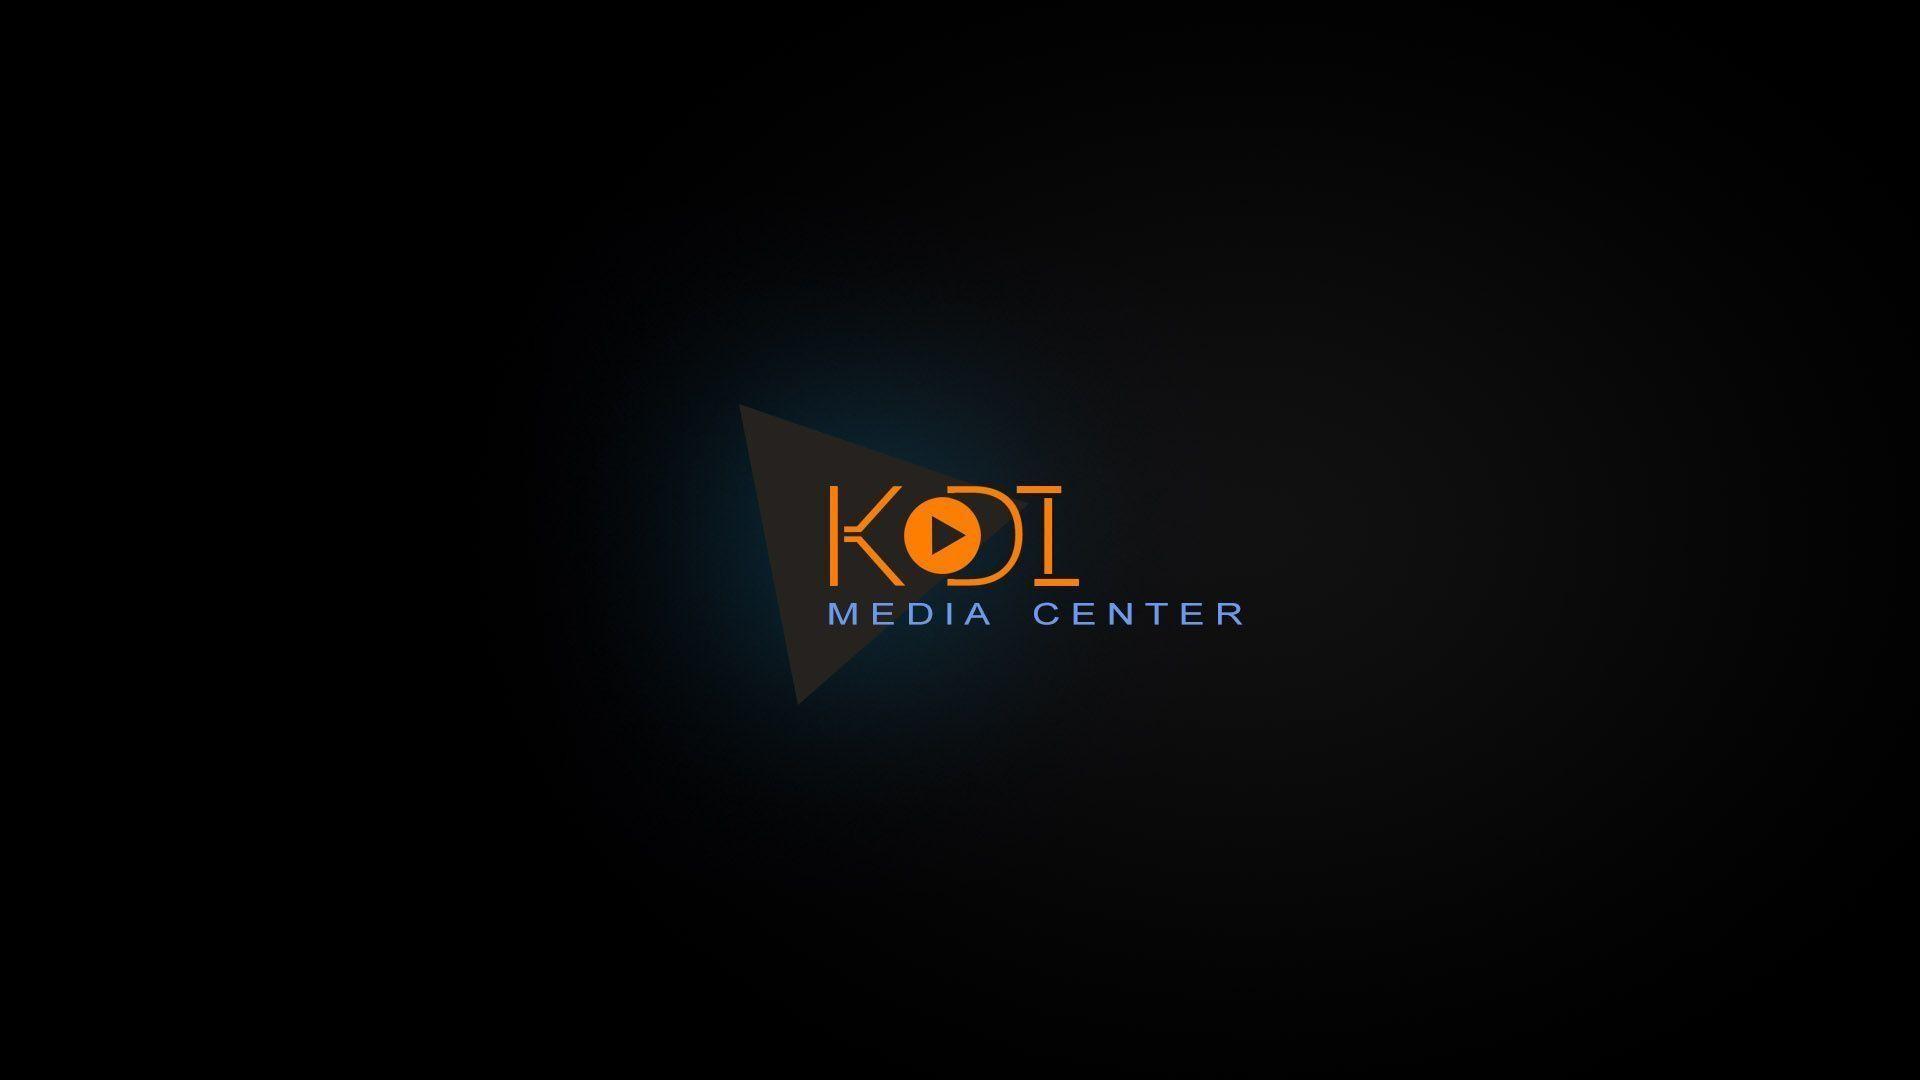 Kodi Background 1080p Wallpapers – WallpaperSafari